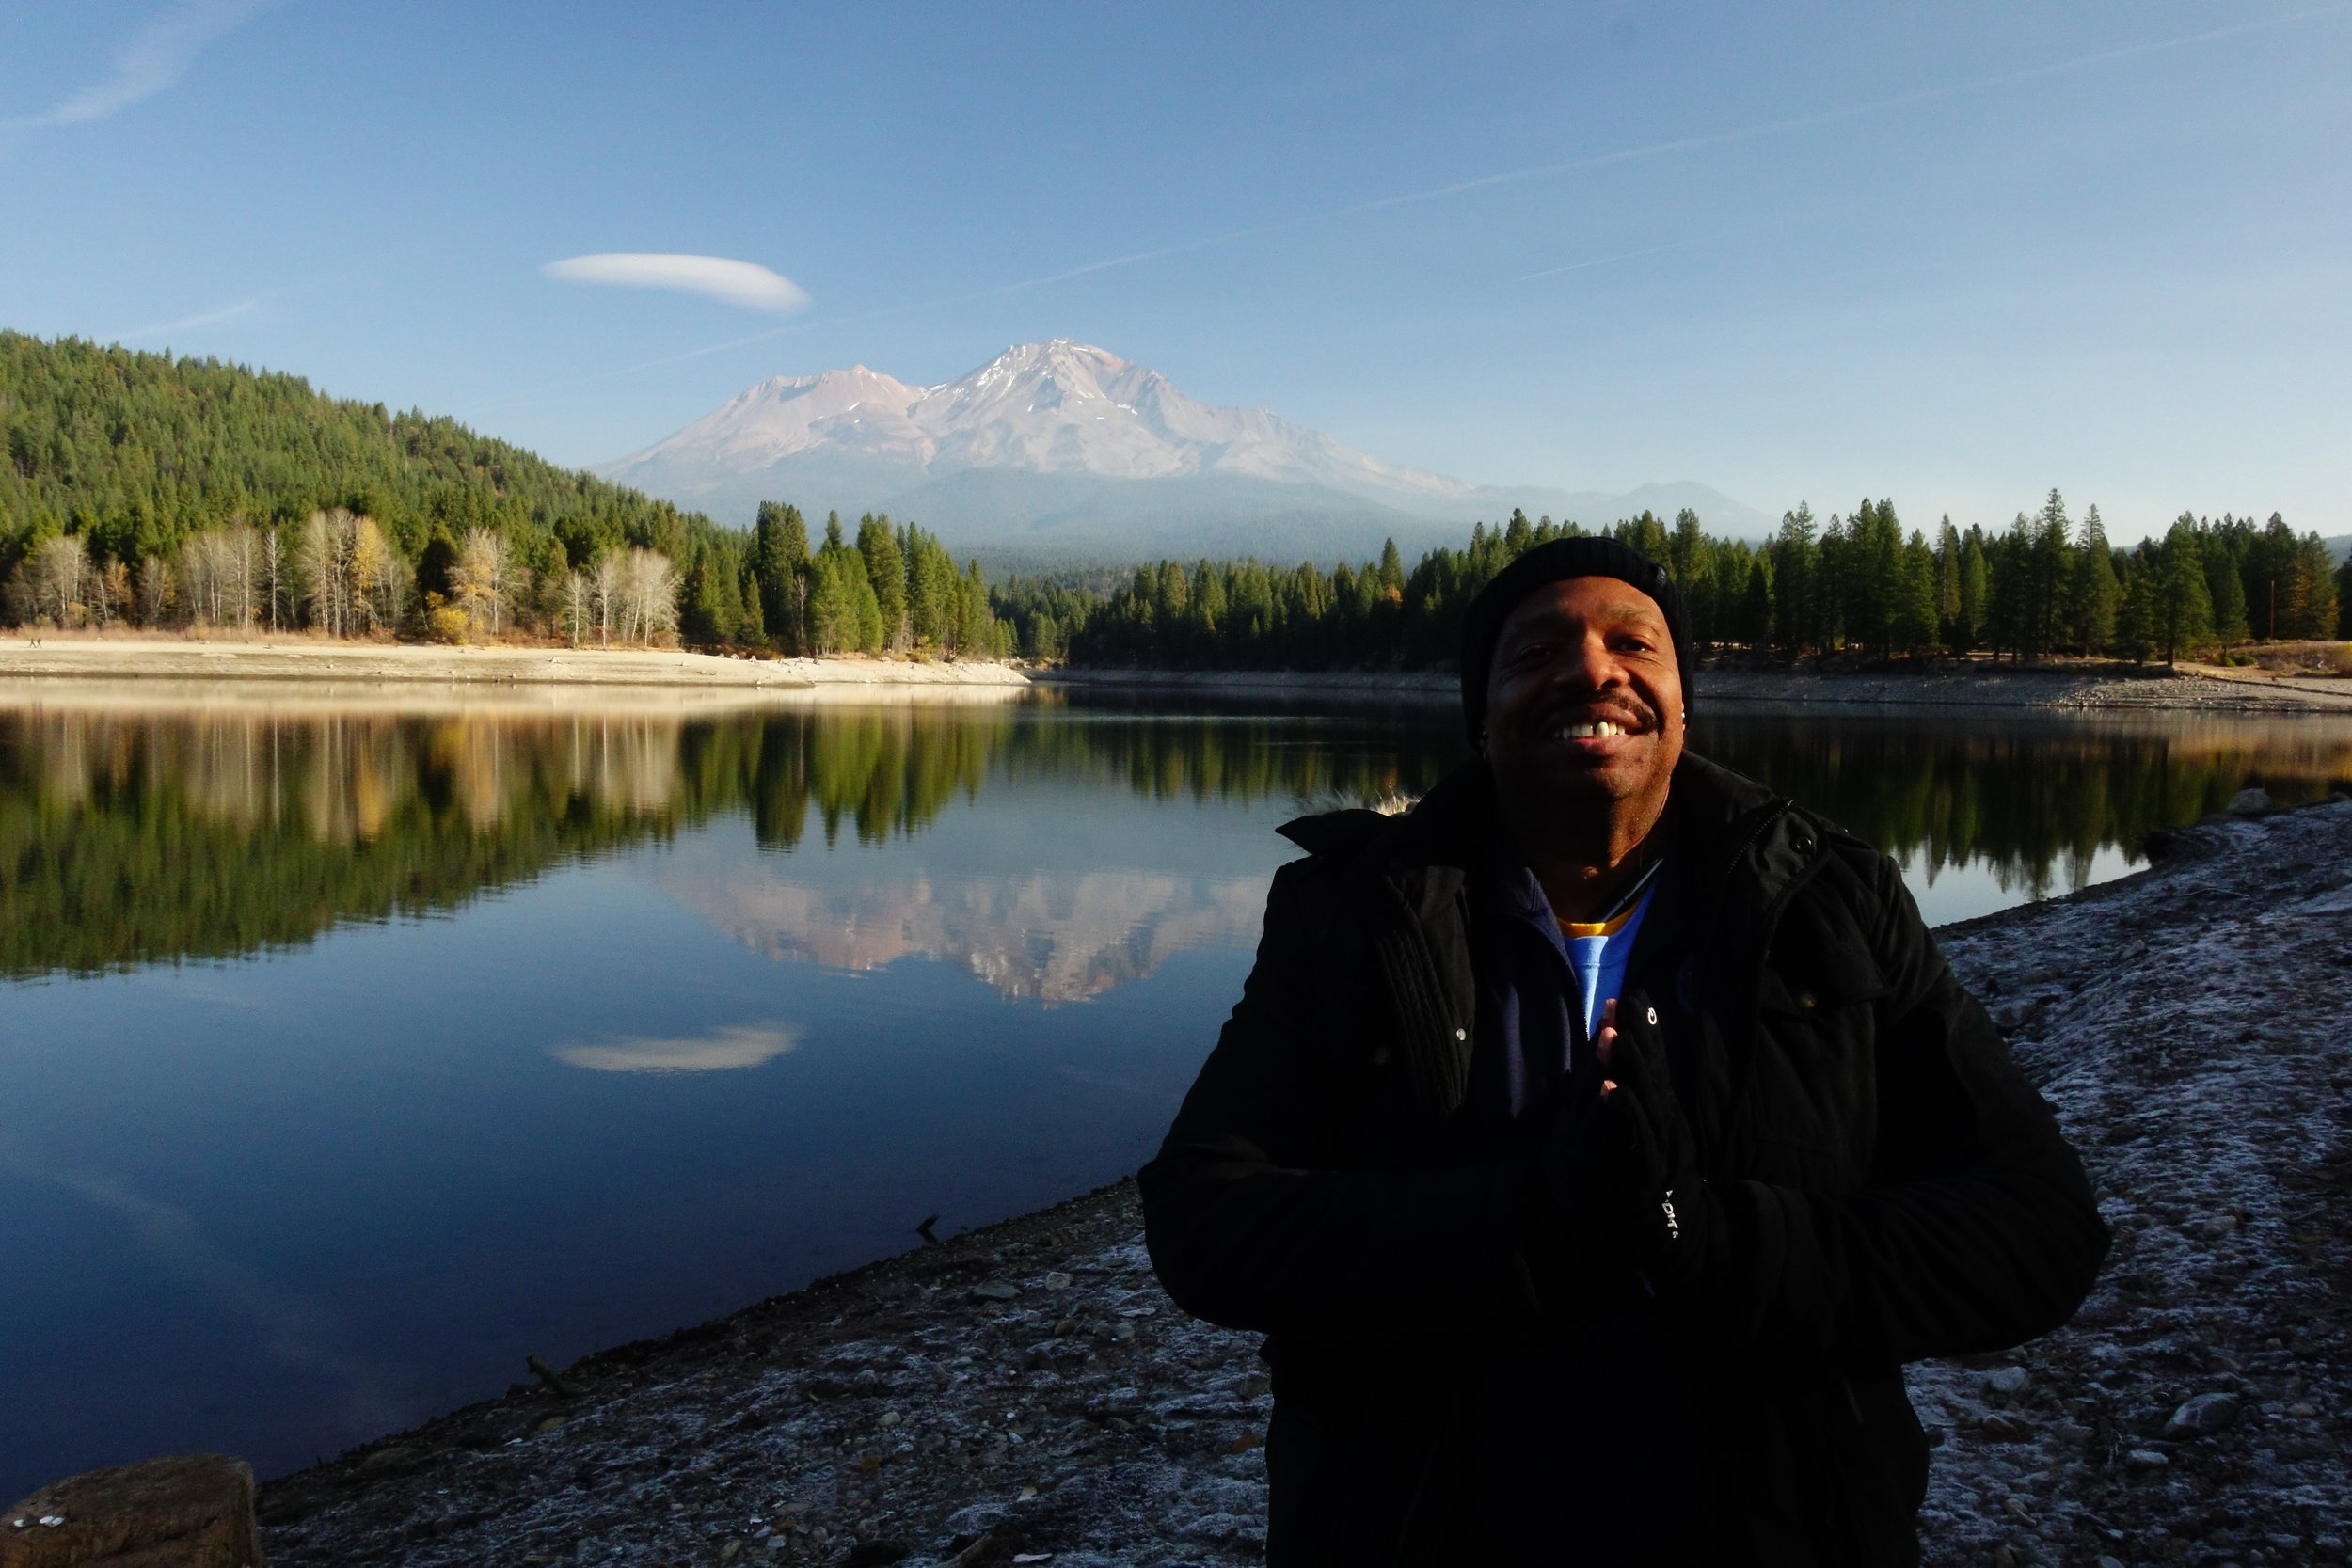 mt. Shasta Spiritual Tours Homepage